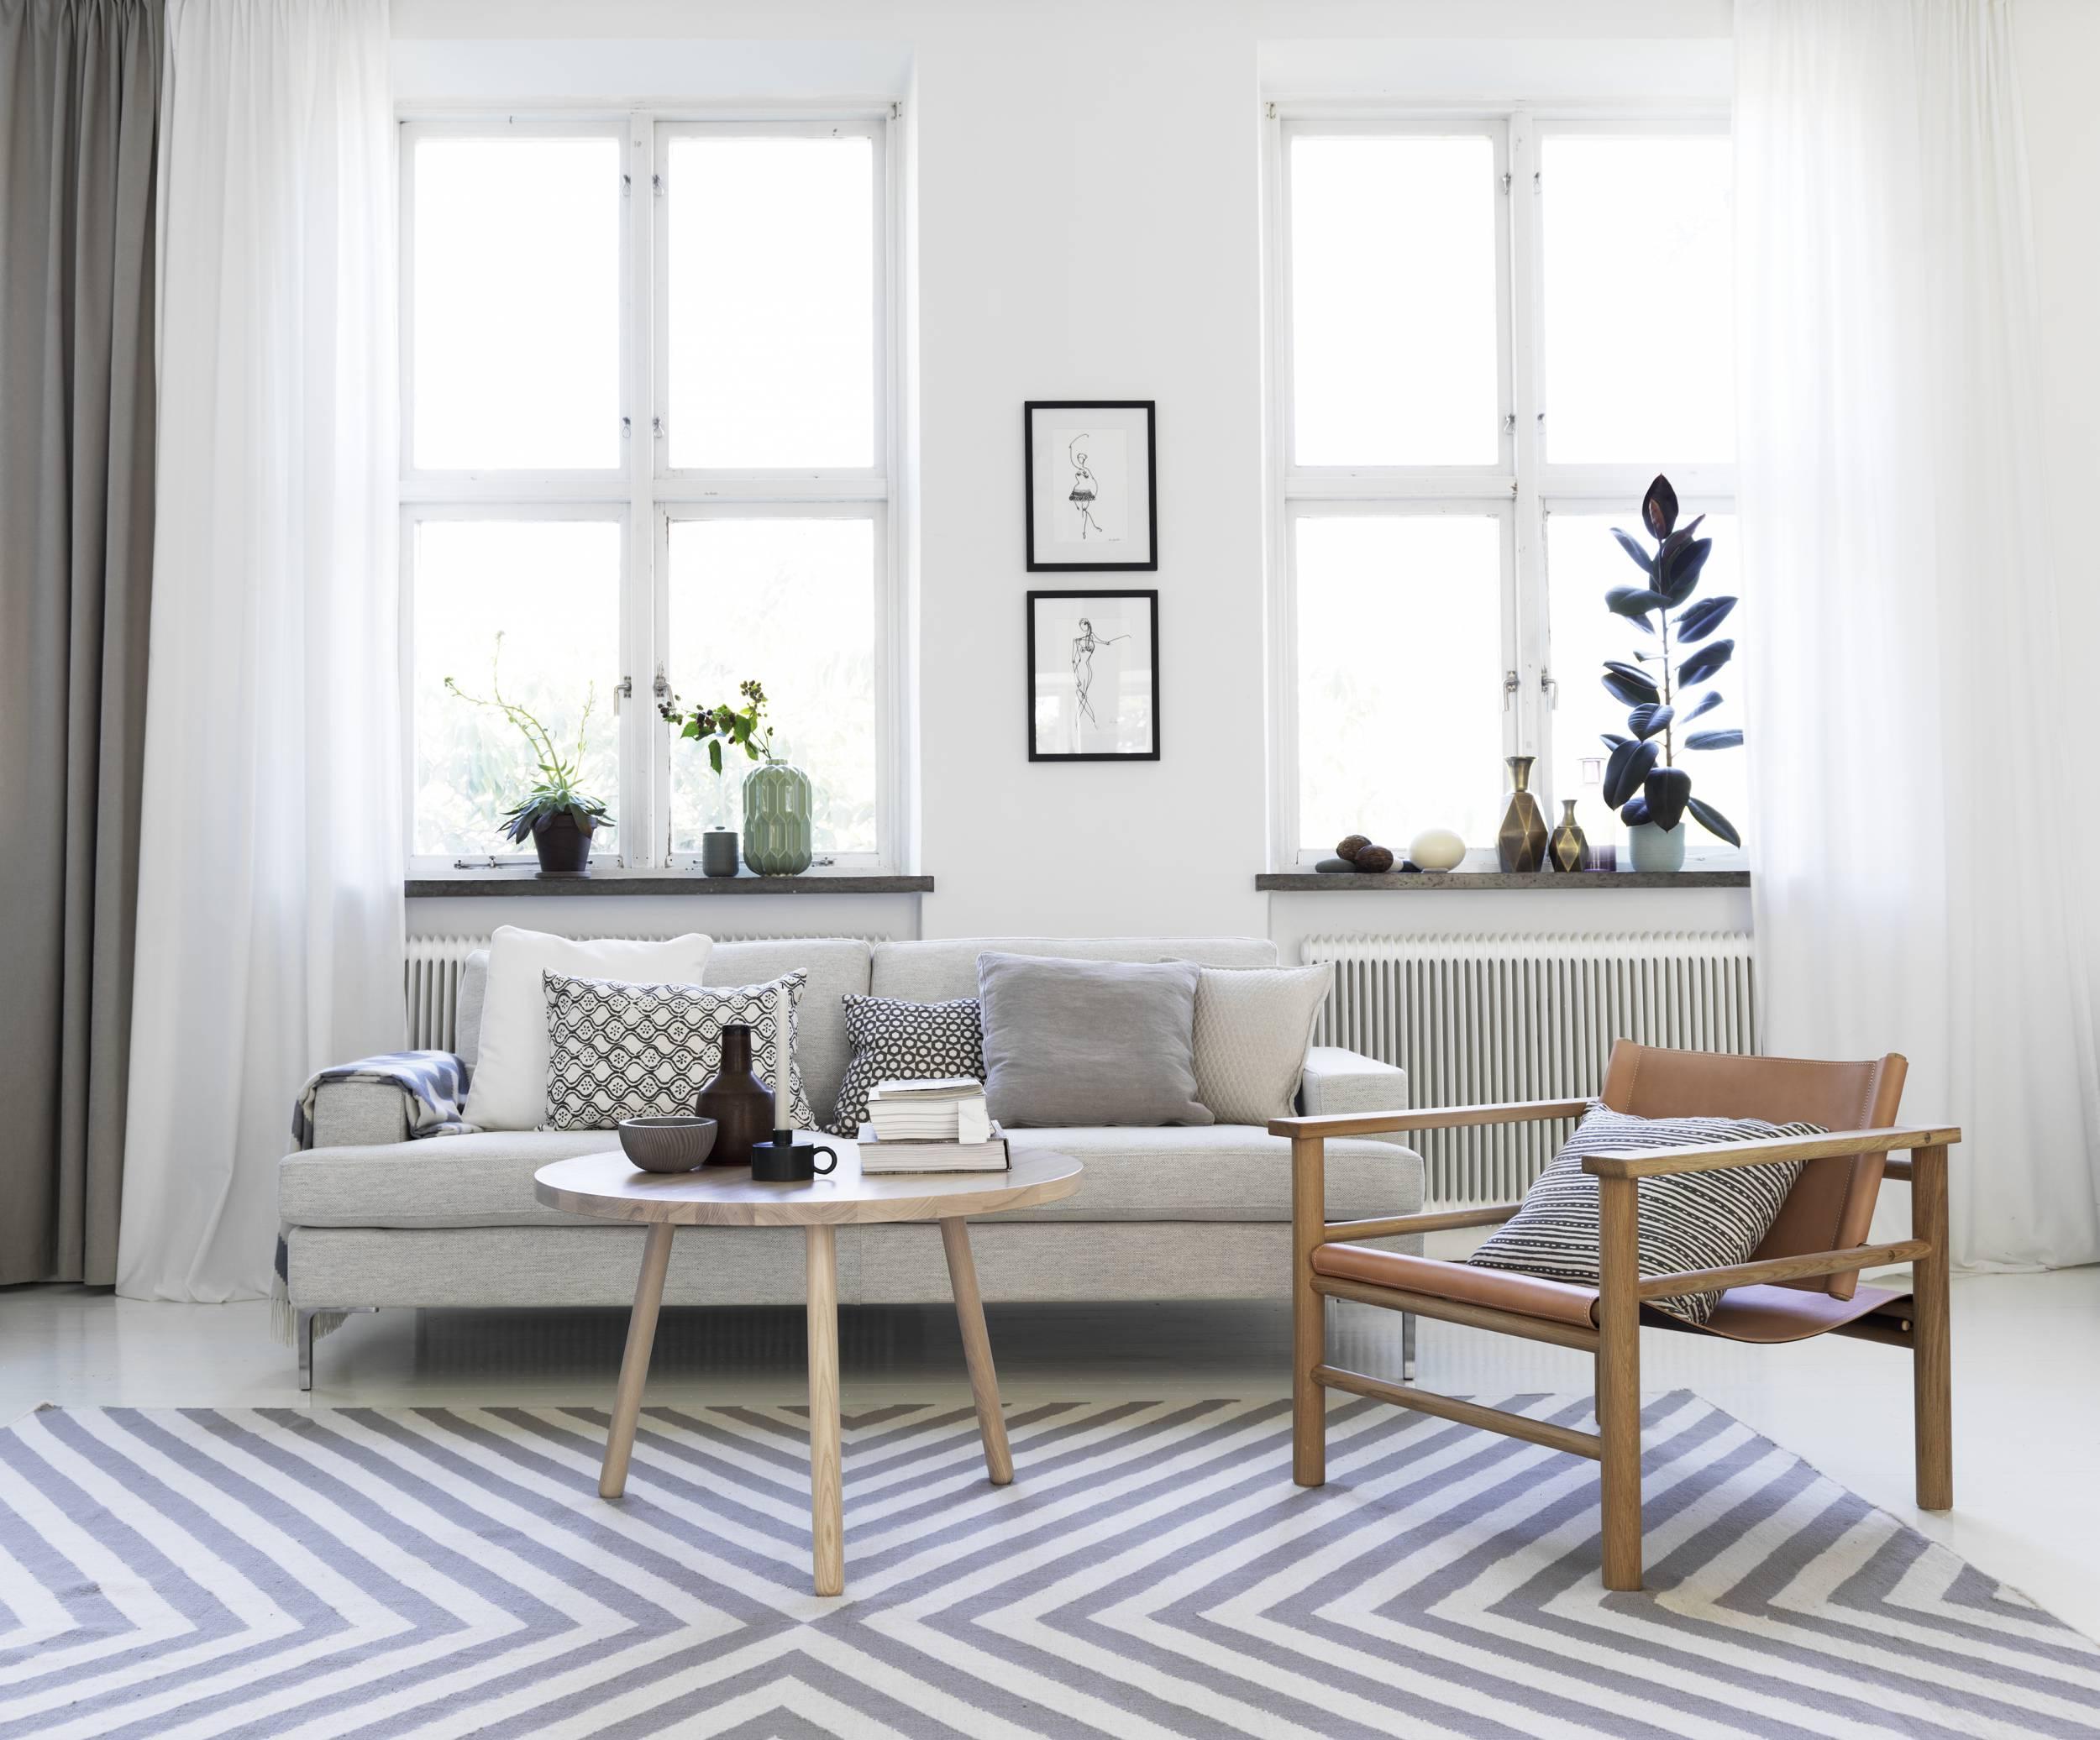 Ire- infini sofa